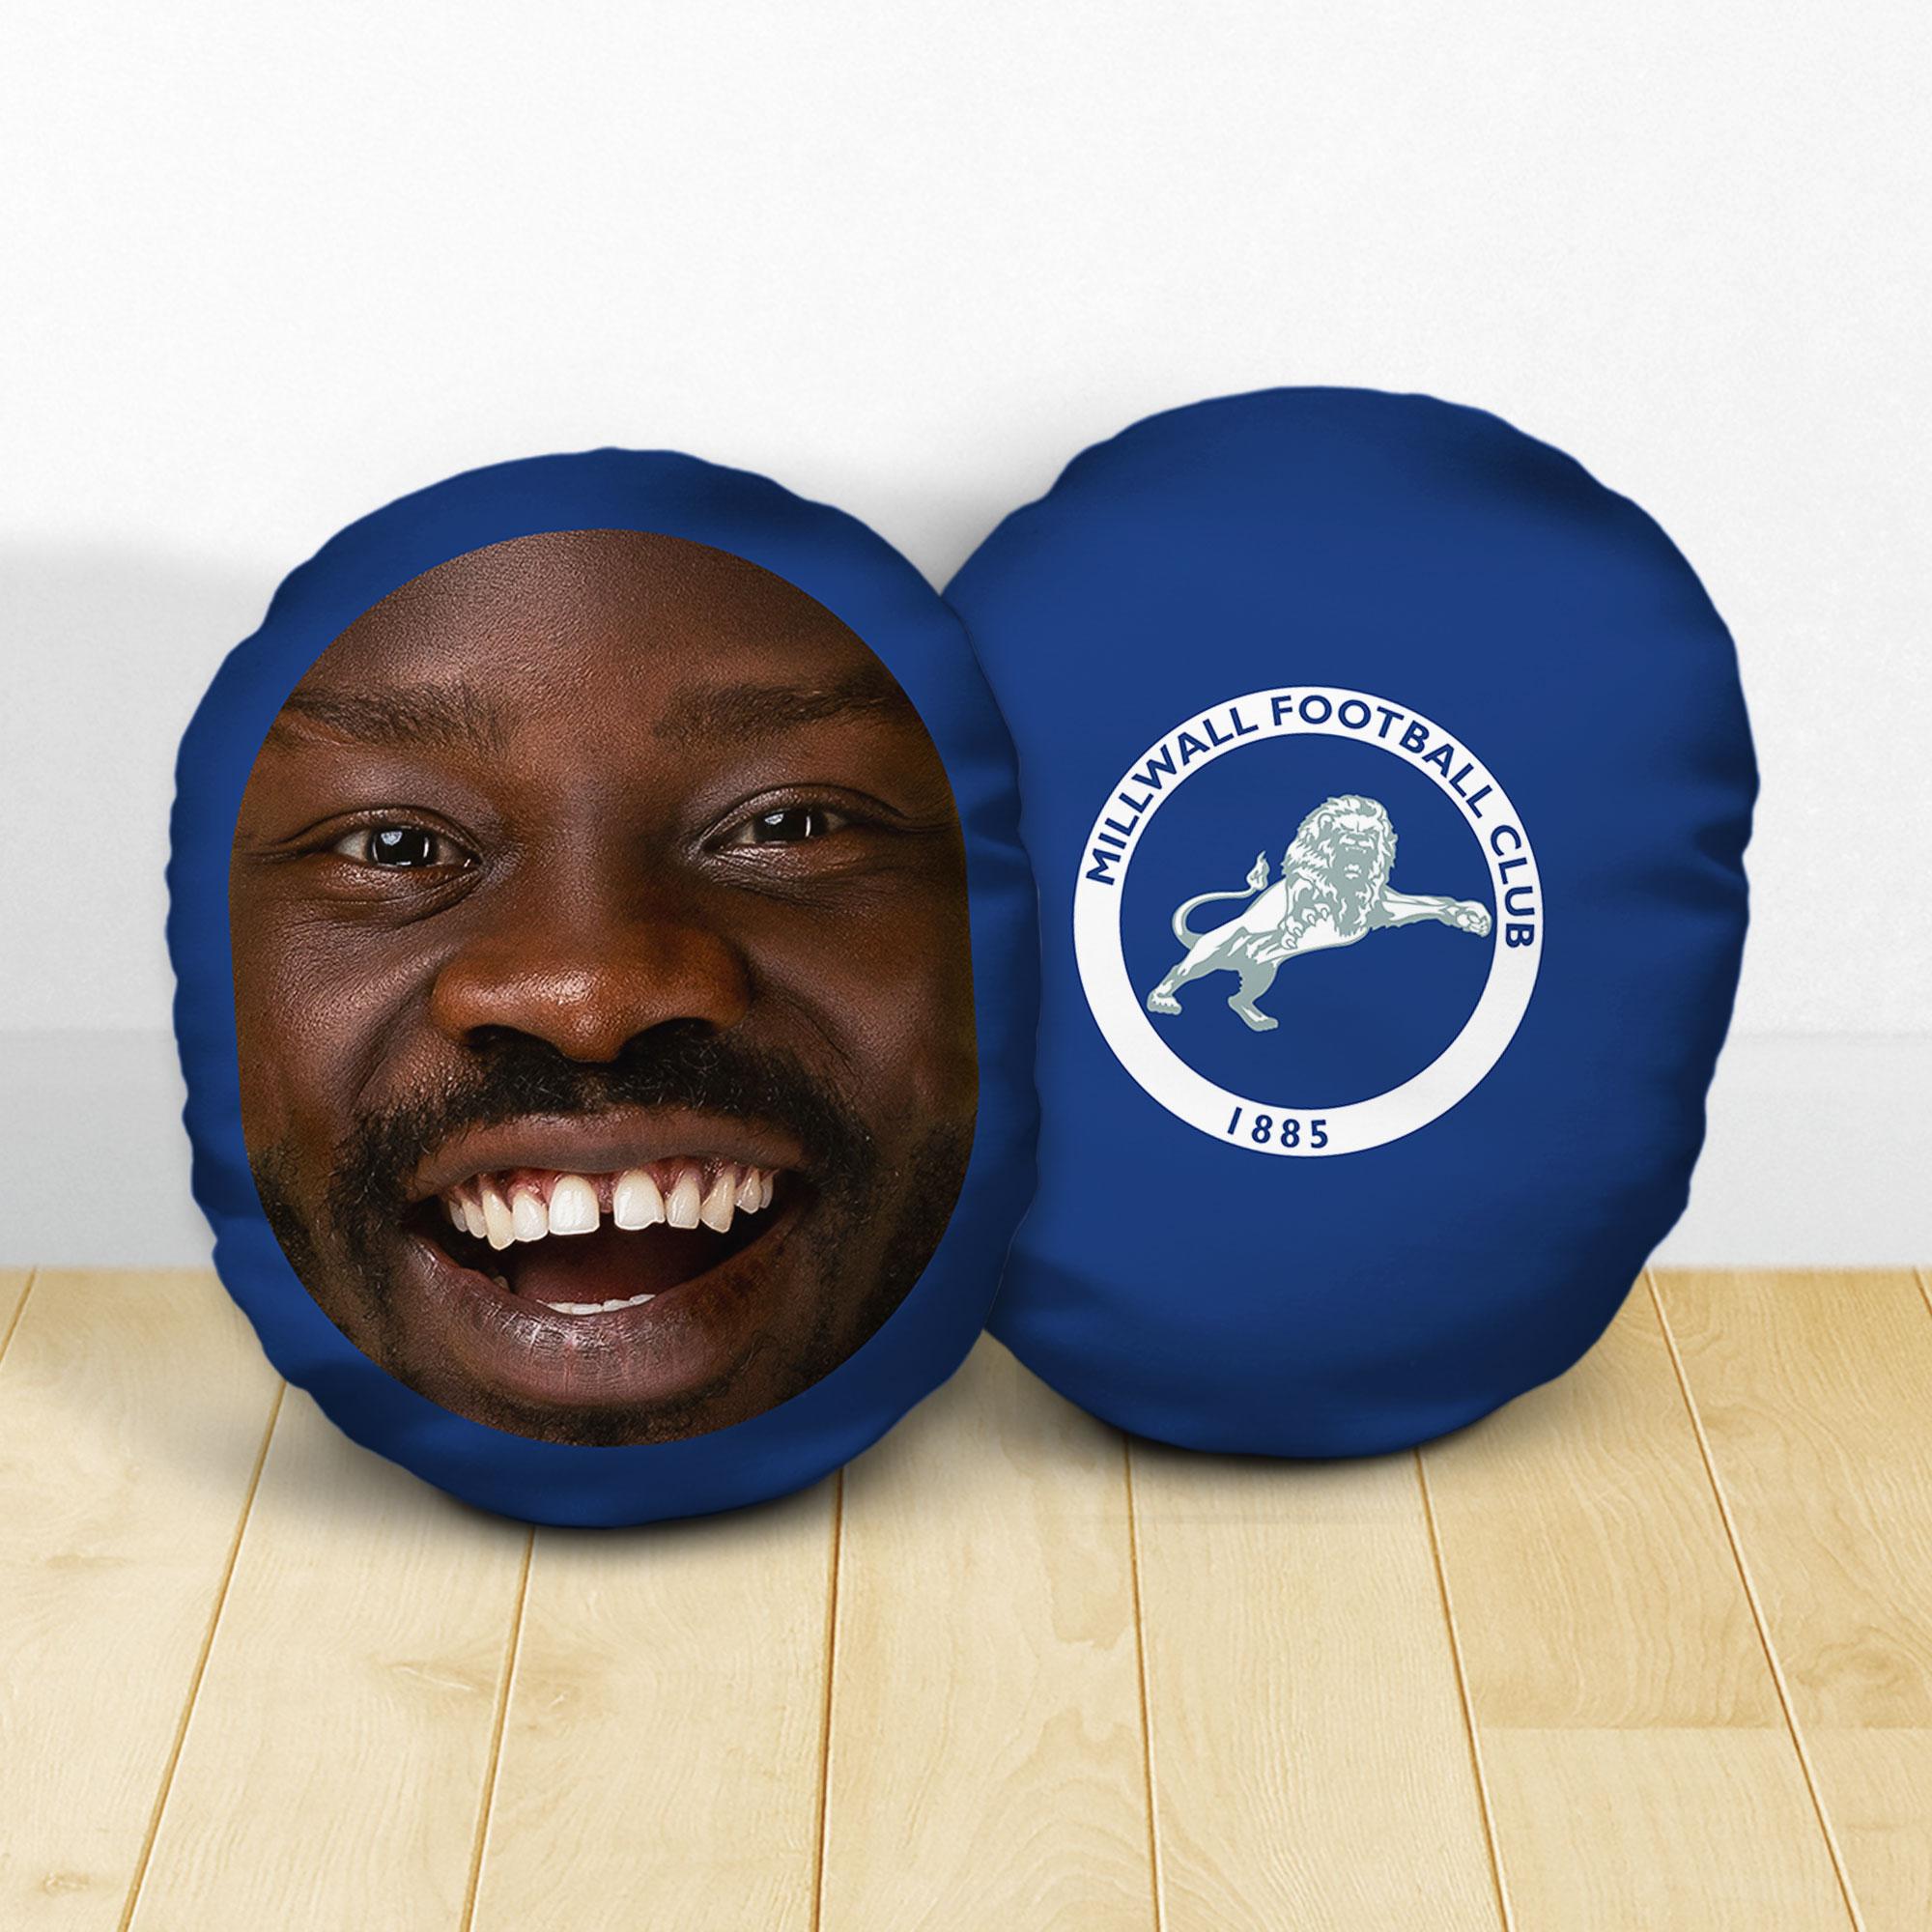 Personalised Millwall FC Crest Mush Cush